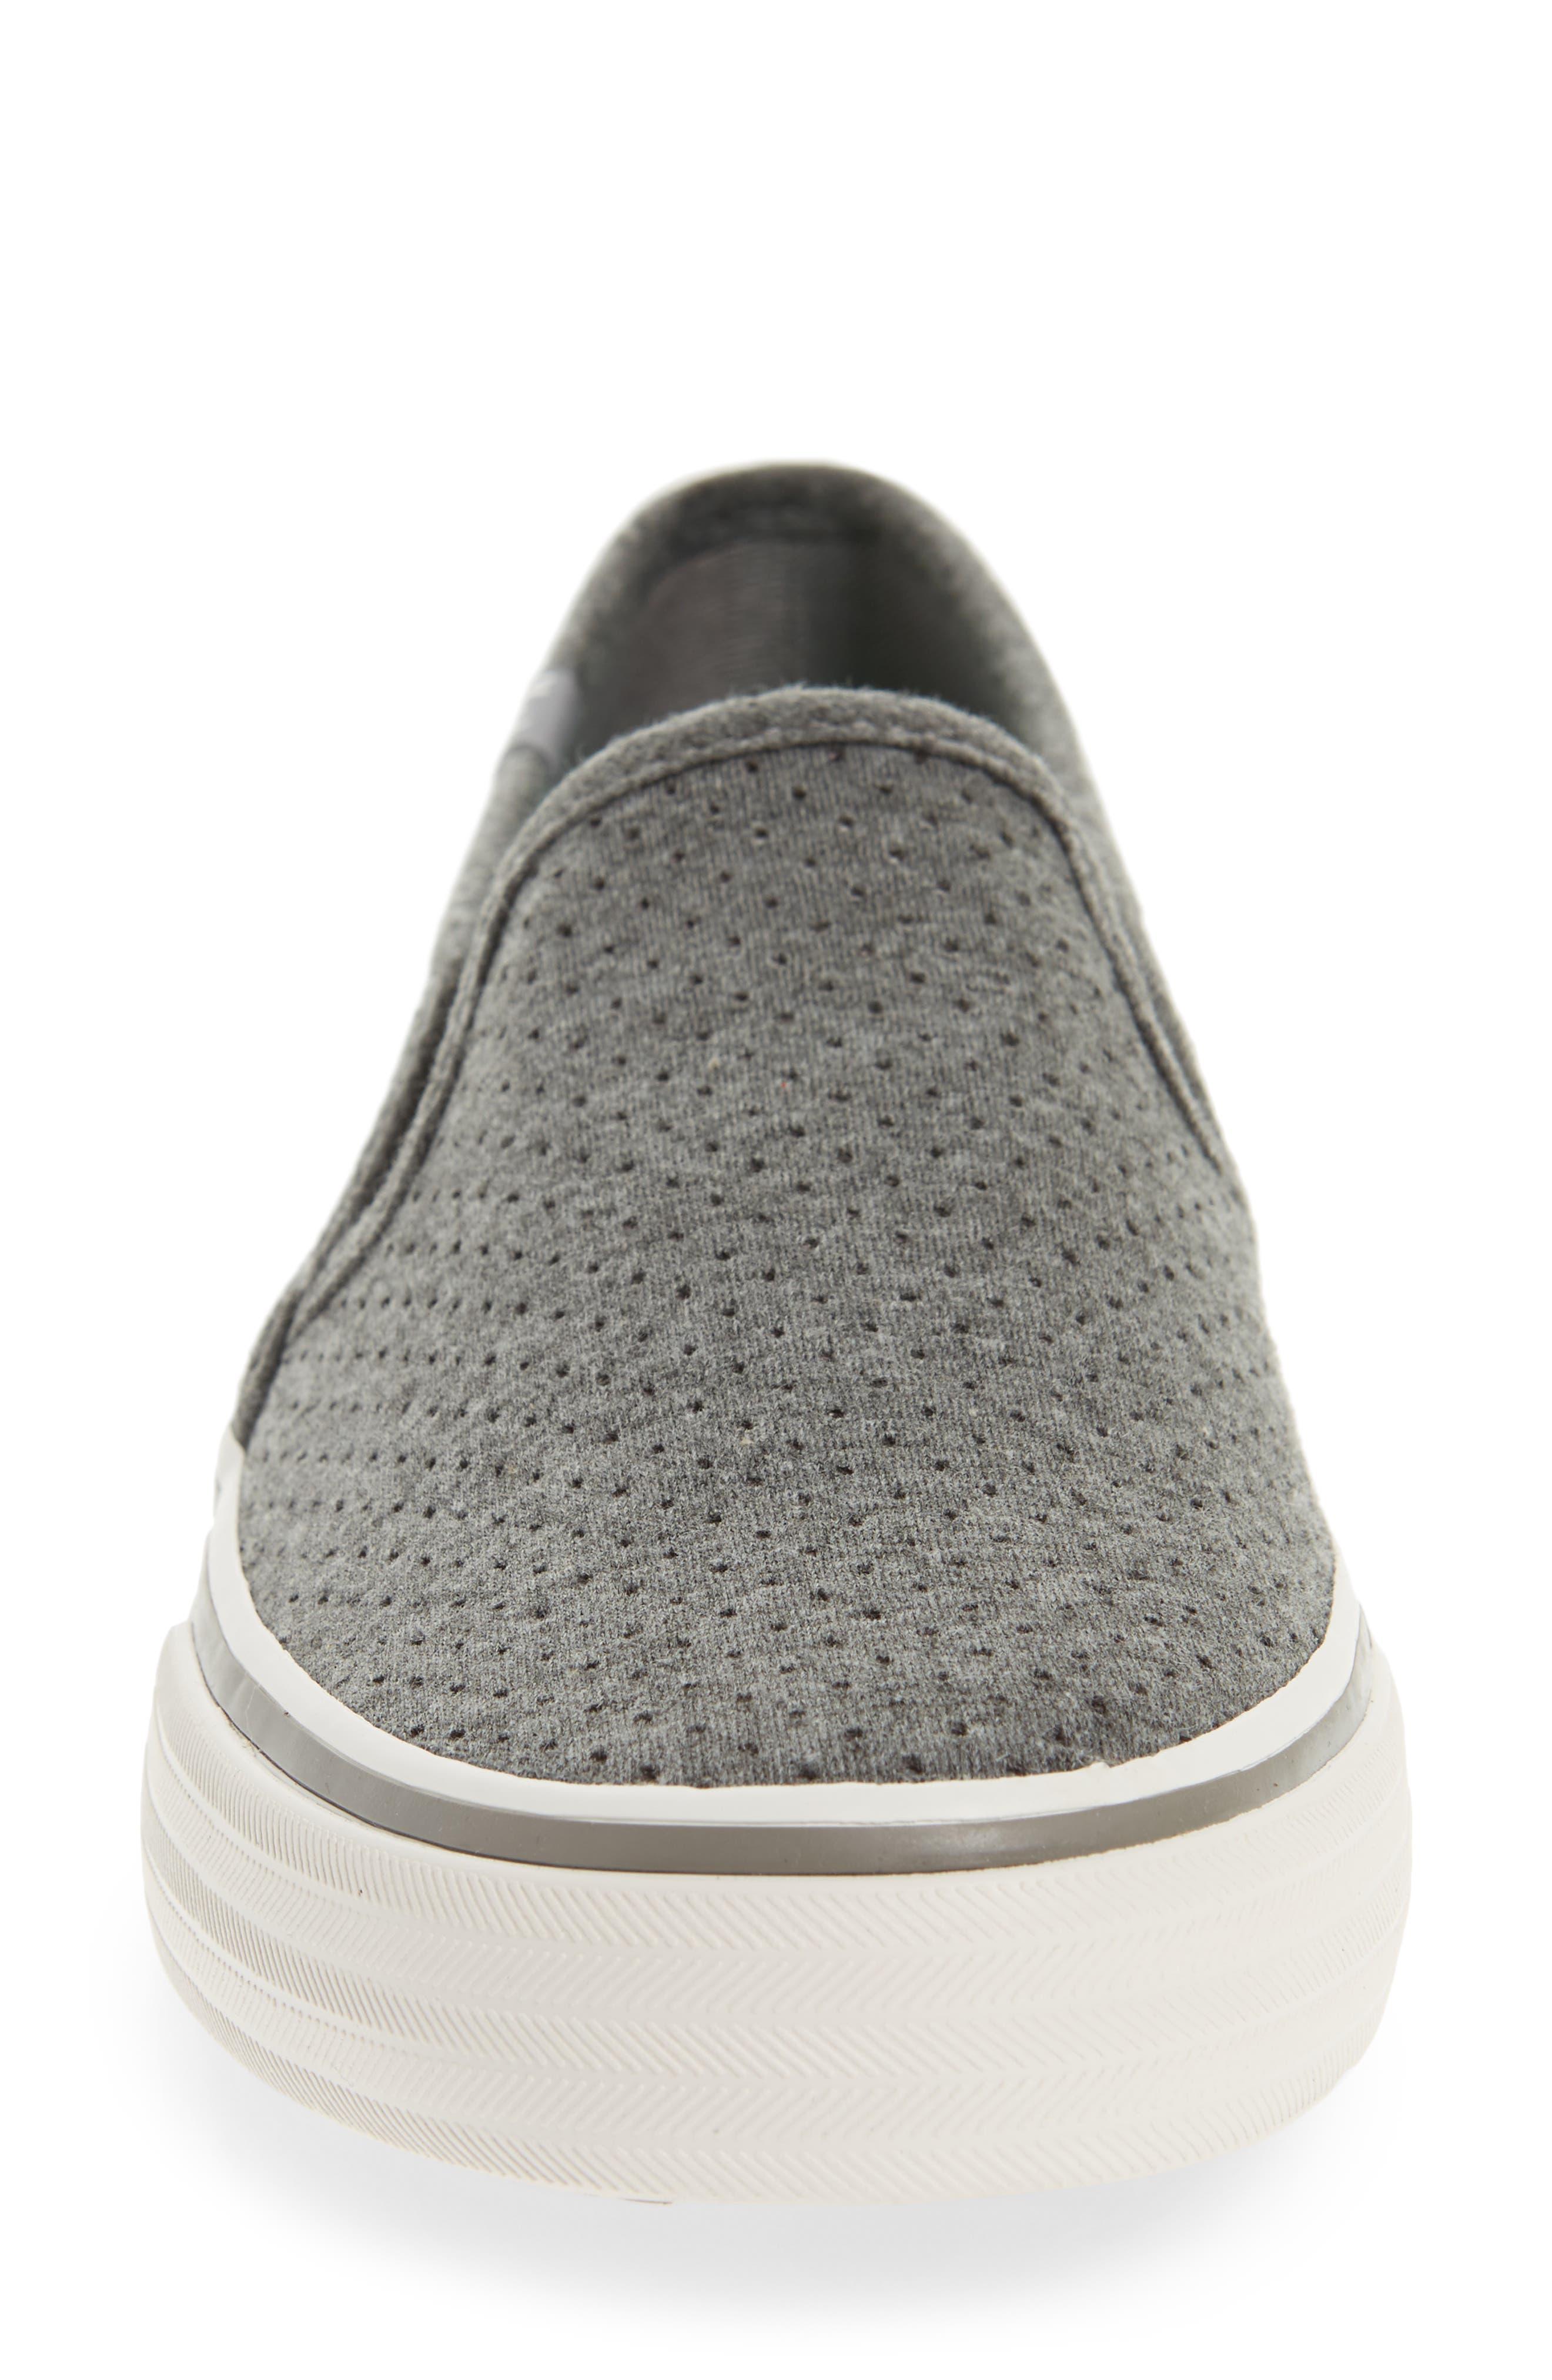 Double Decker Perforated Slip-On Sneaker,                             Alternate thumbnail 4, color,